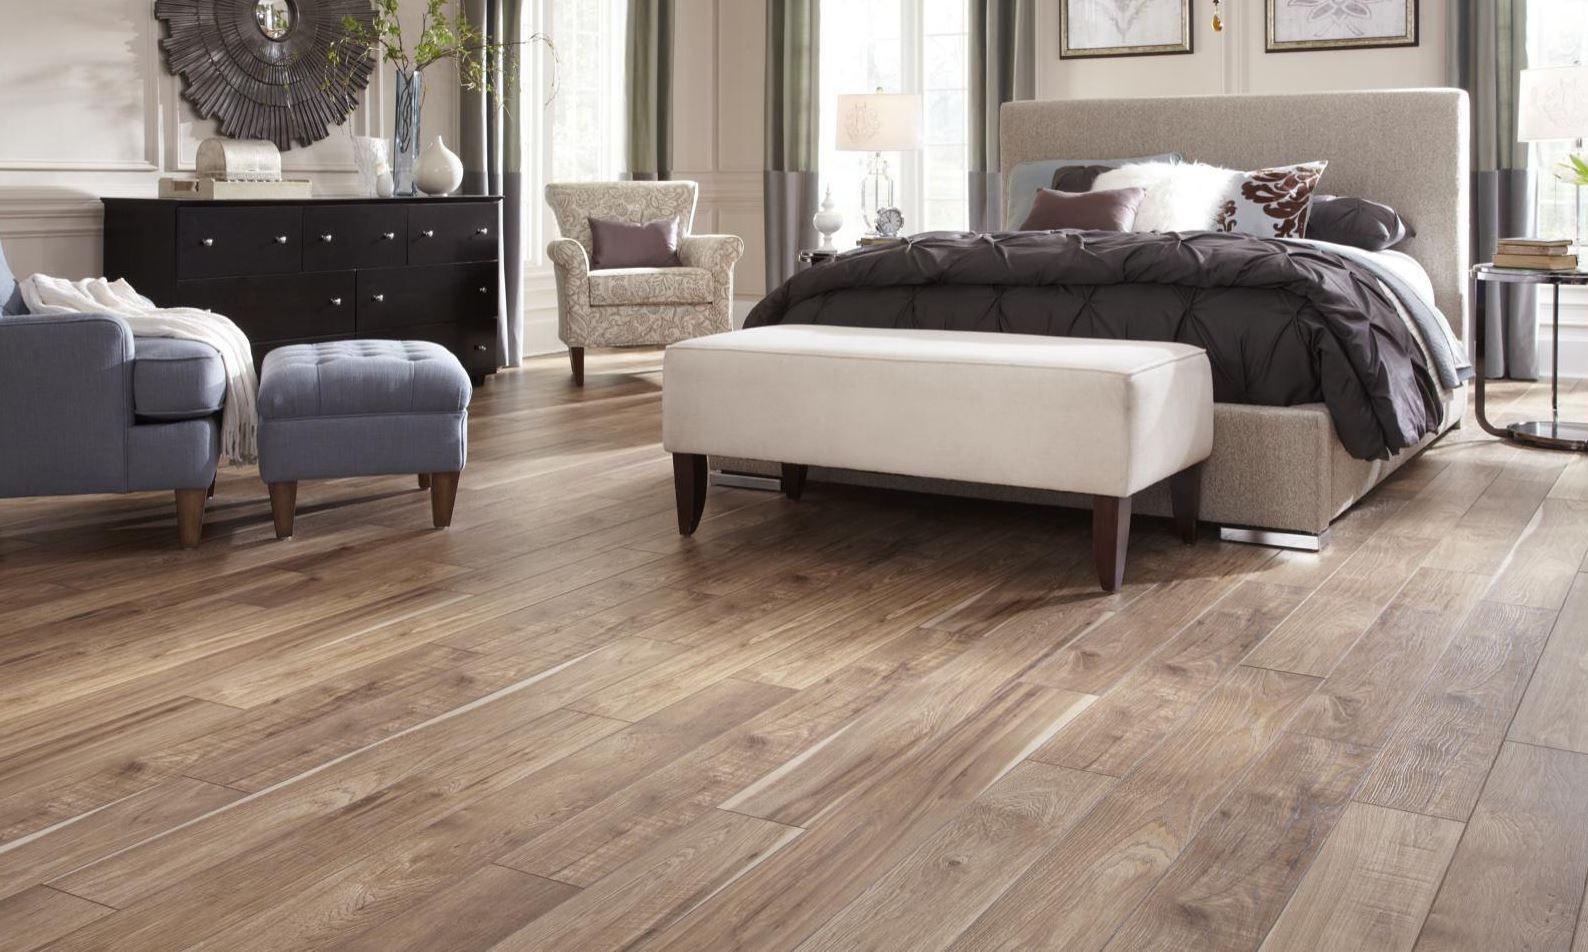 19 Trendy Dark Walnut Hardwood Floors 2021 free download dark walnut hardwood floors of luxury vinyl plank flooring that looks like wood pertaining to mannington adura luxury vinyl plank flooring 57aa7d065f9b58974a2be49e jpg